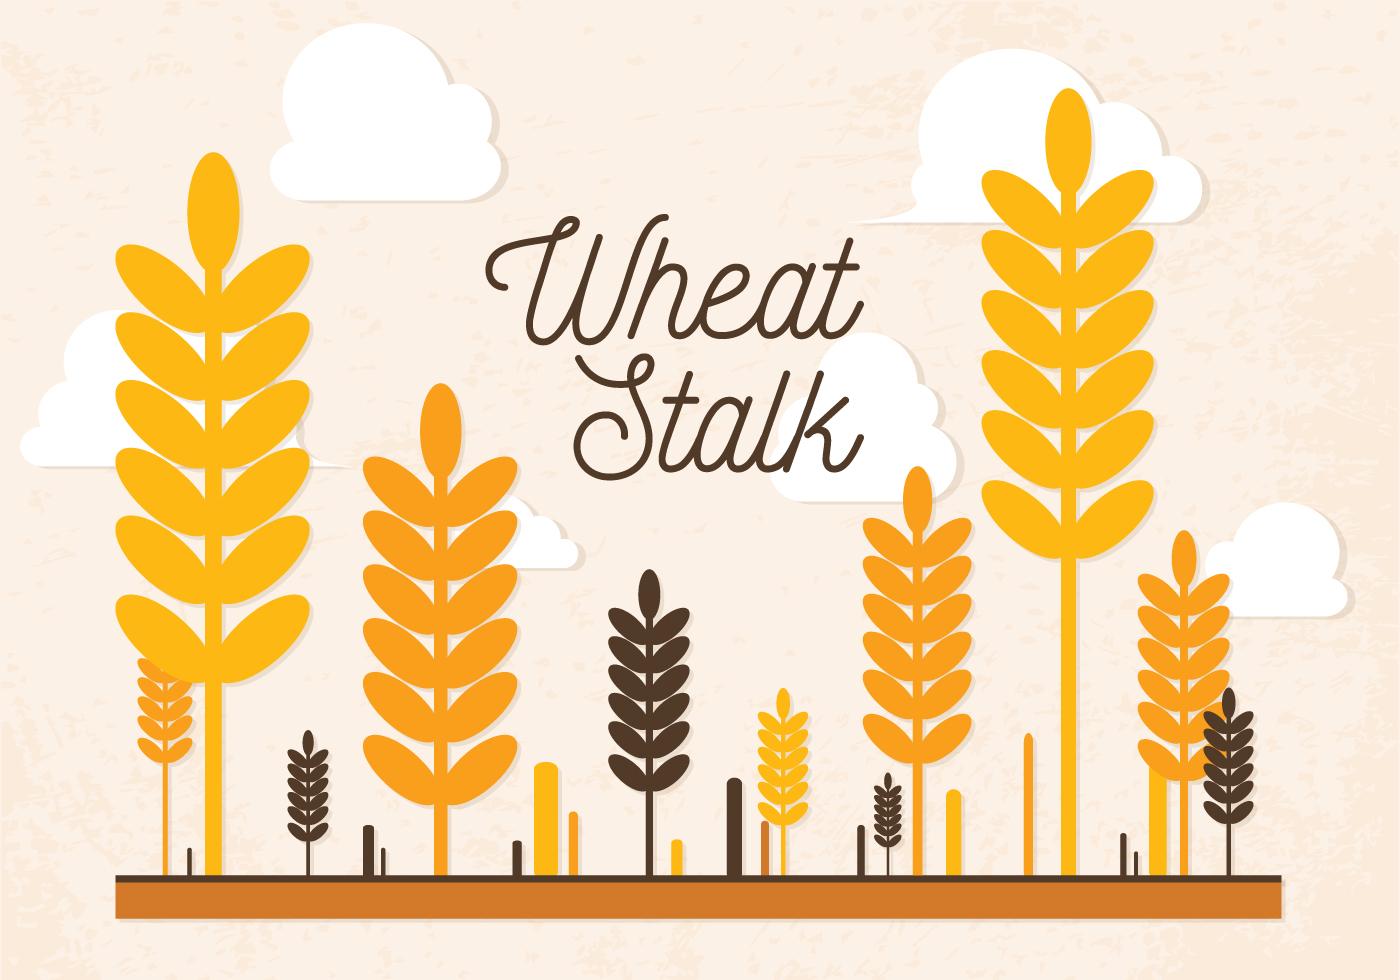 Free Wheat Stalk Vecto...